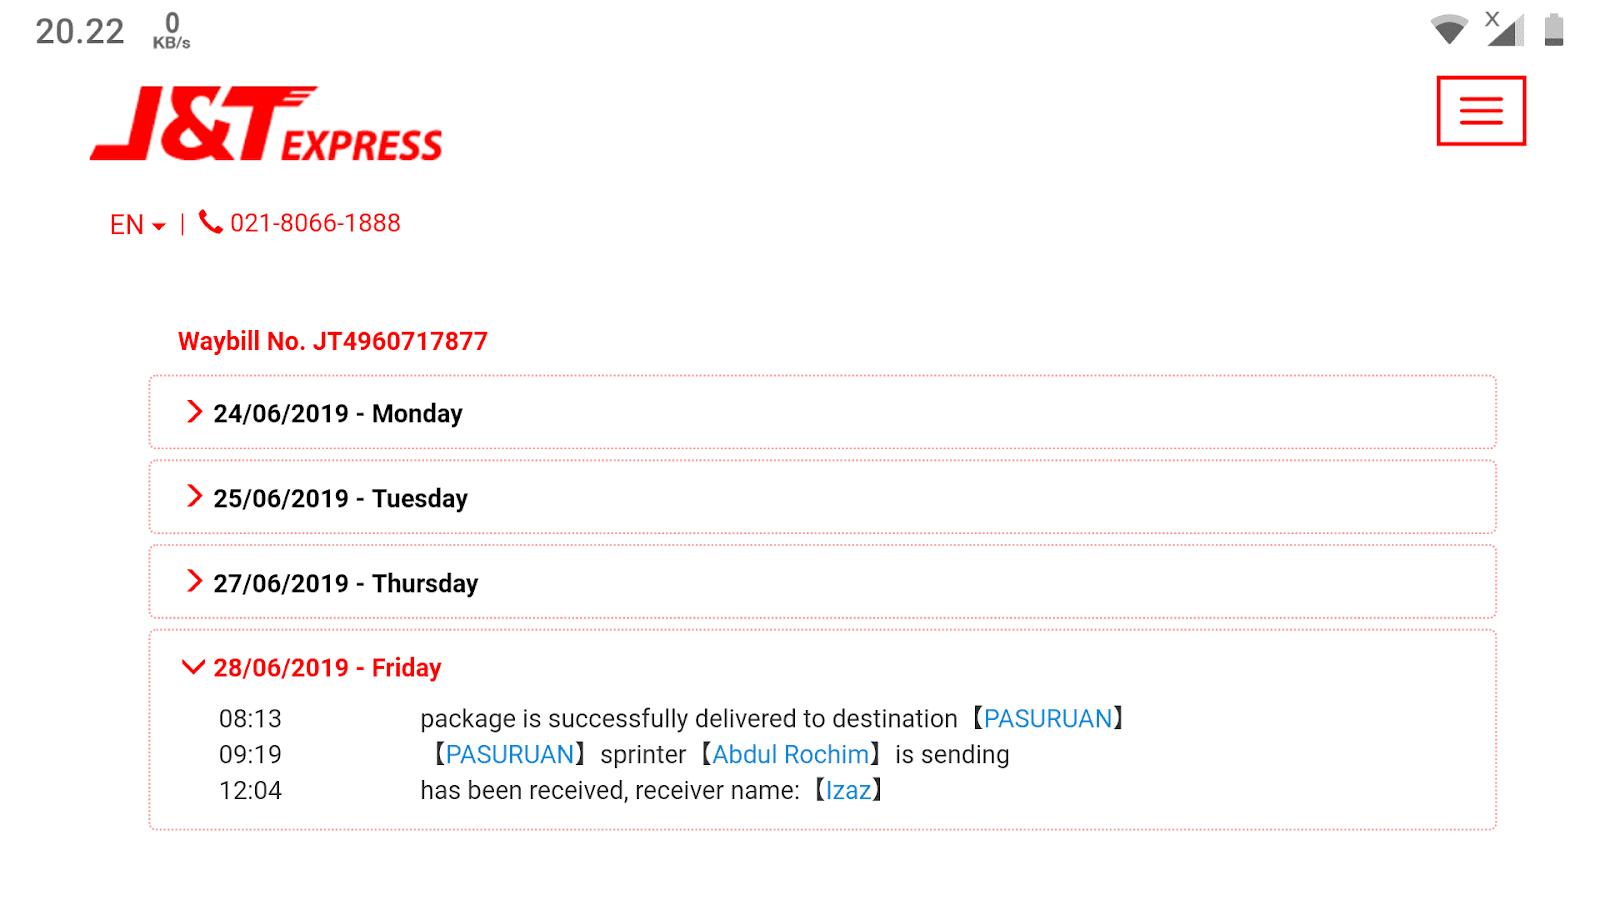 Tracking J&T Express